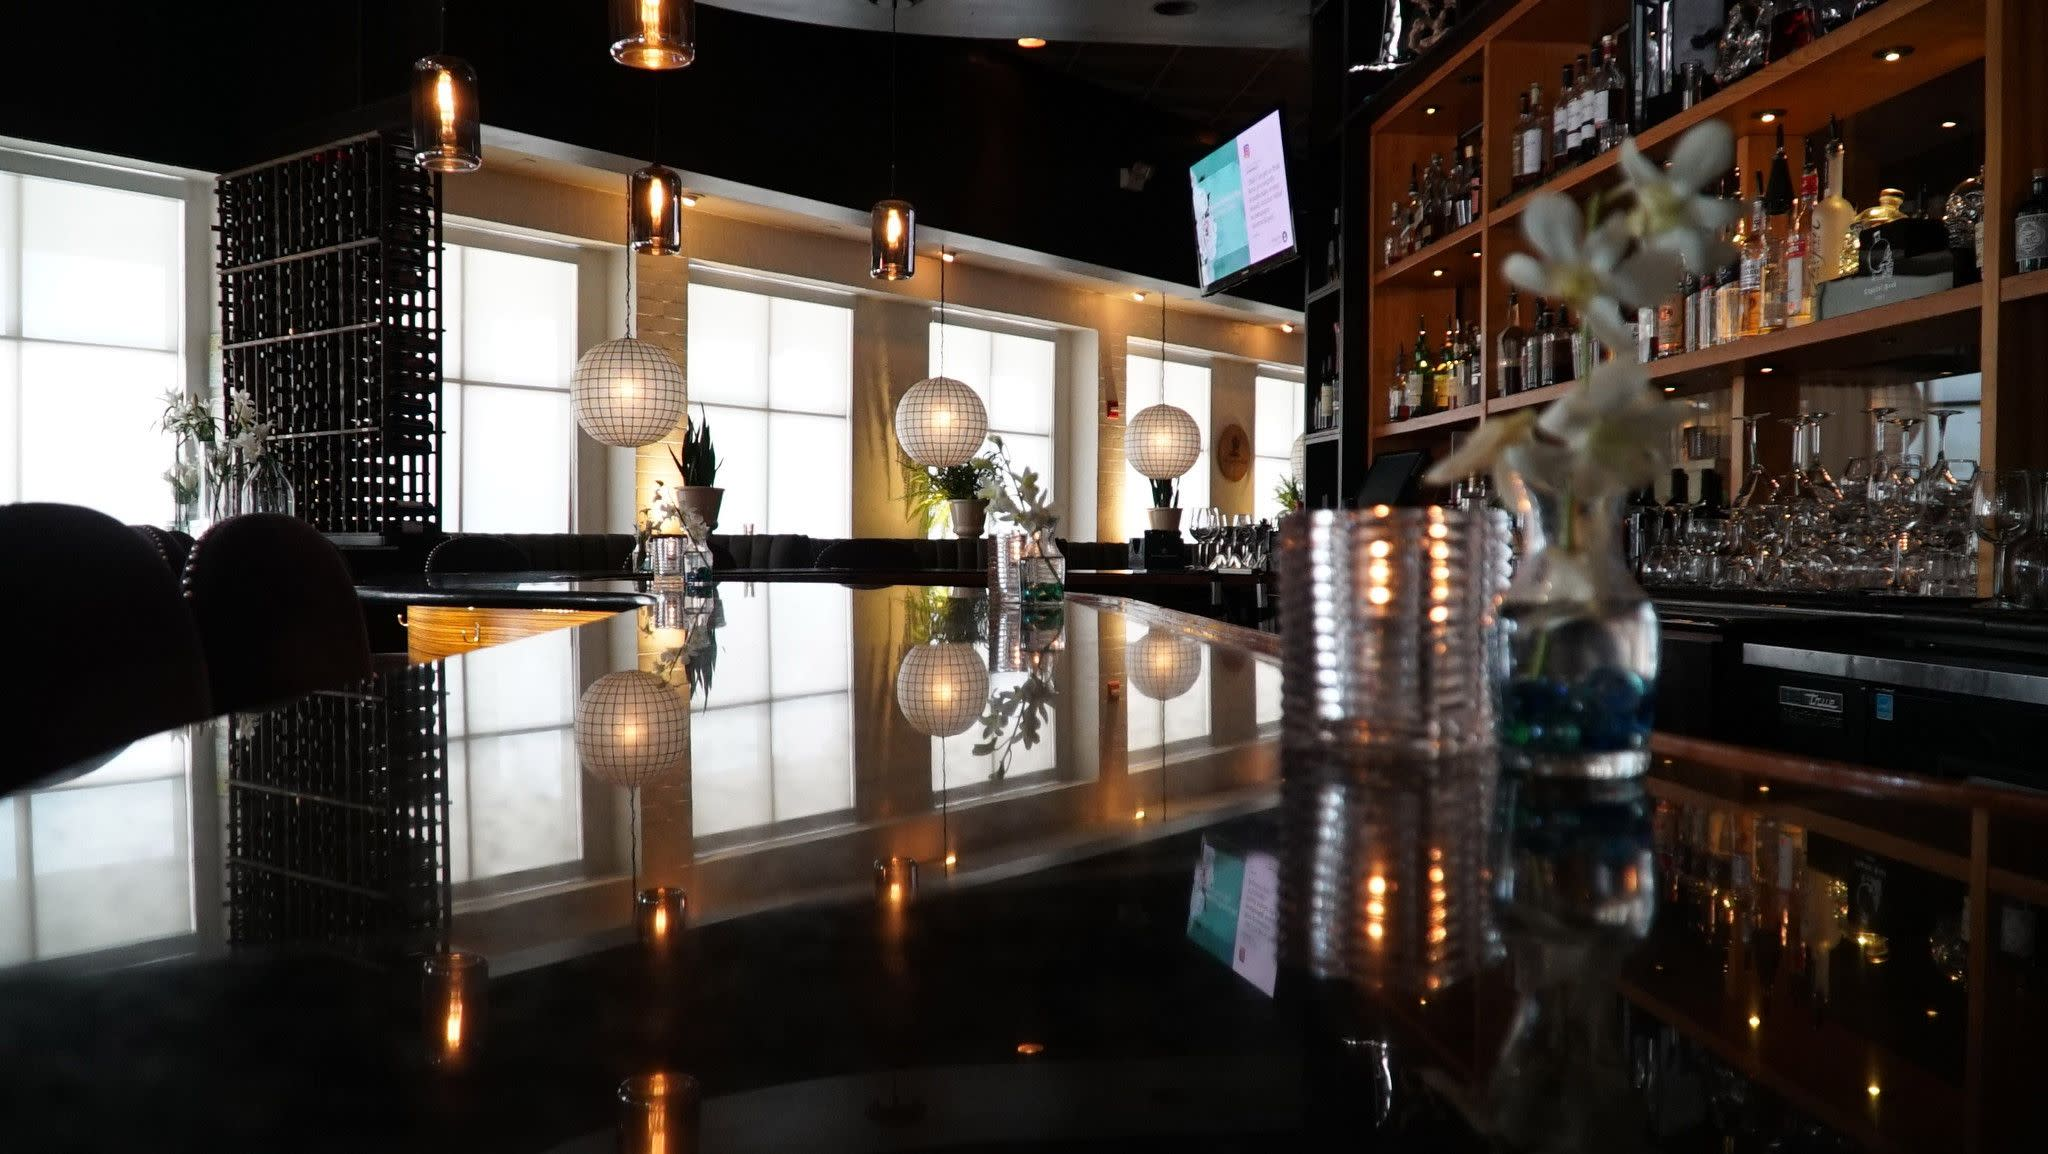 Vines Grille & Wine Bar in Orlando